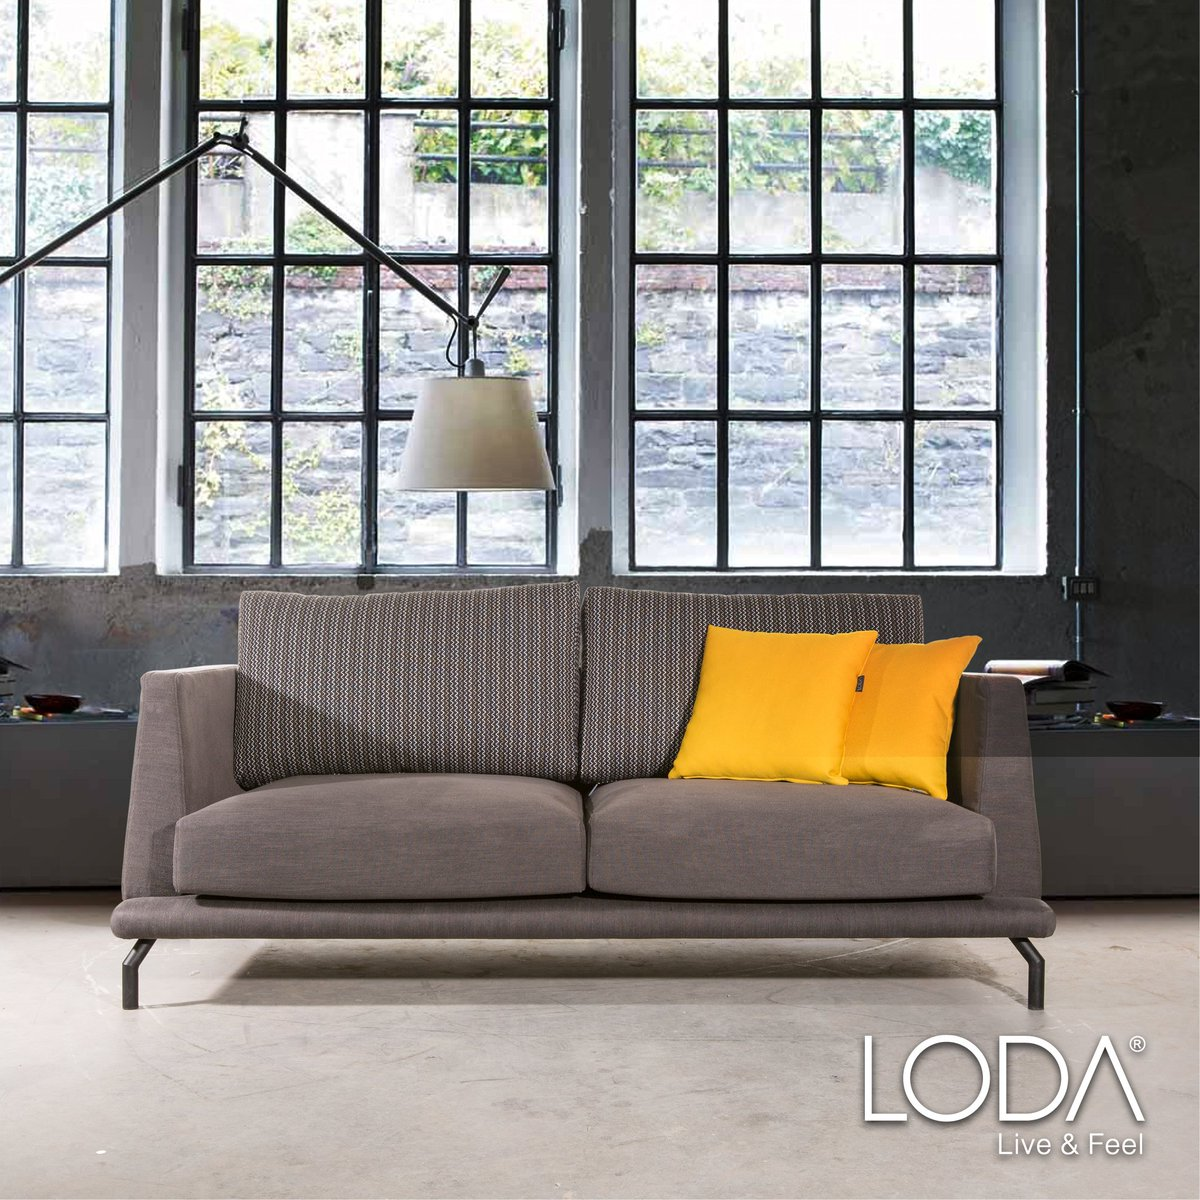 Loda mobilya lodamobilya twitter for Mobilya design